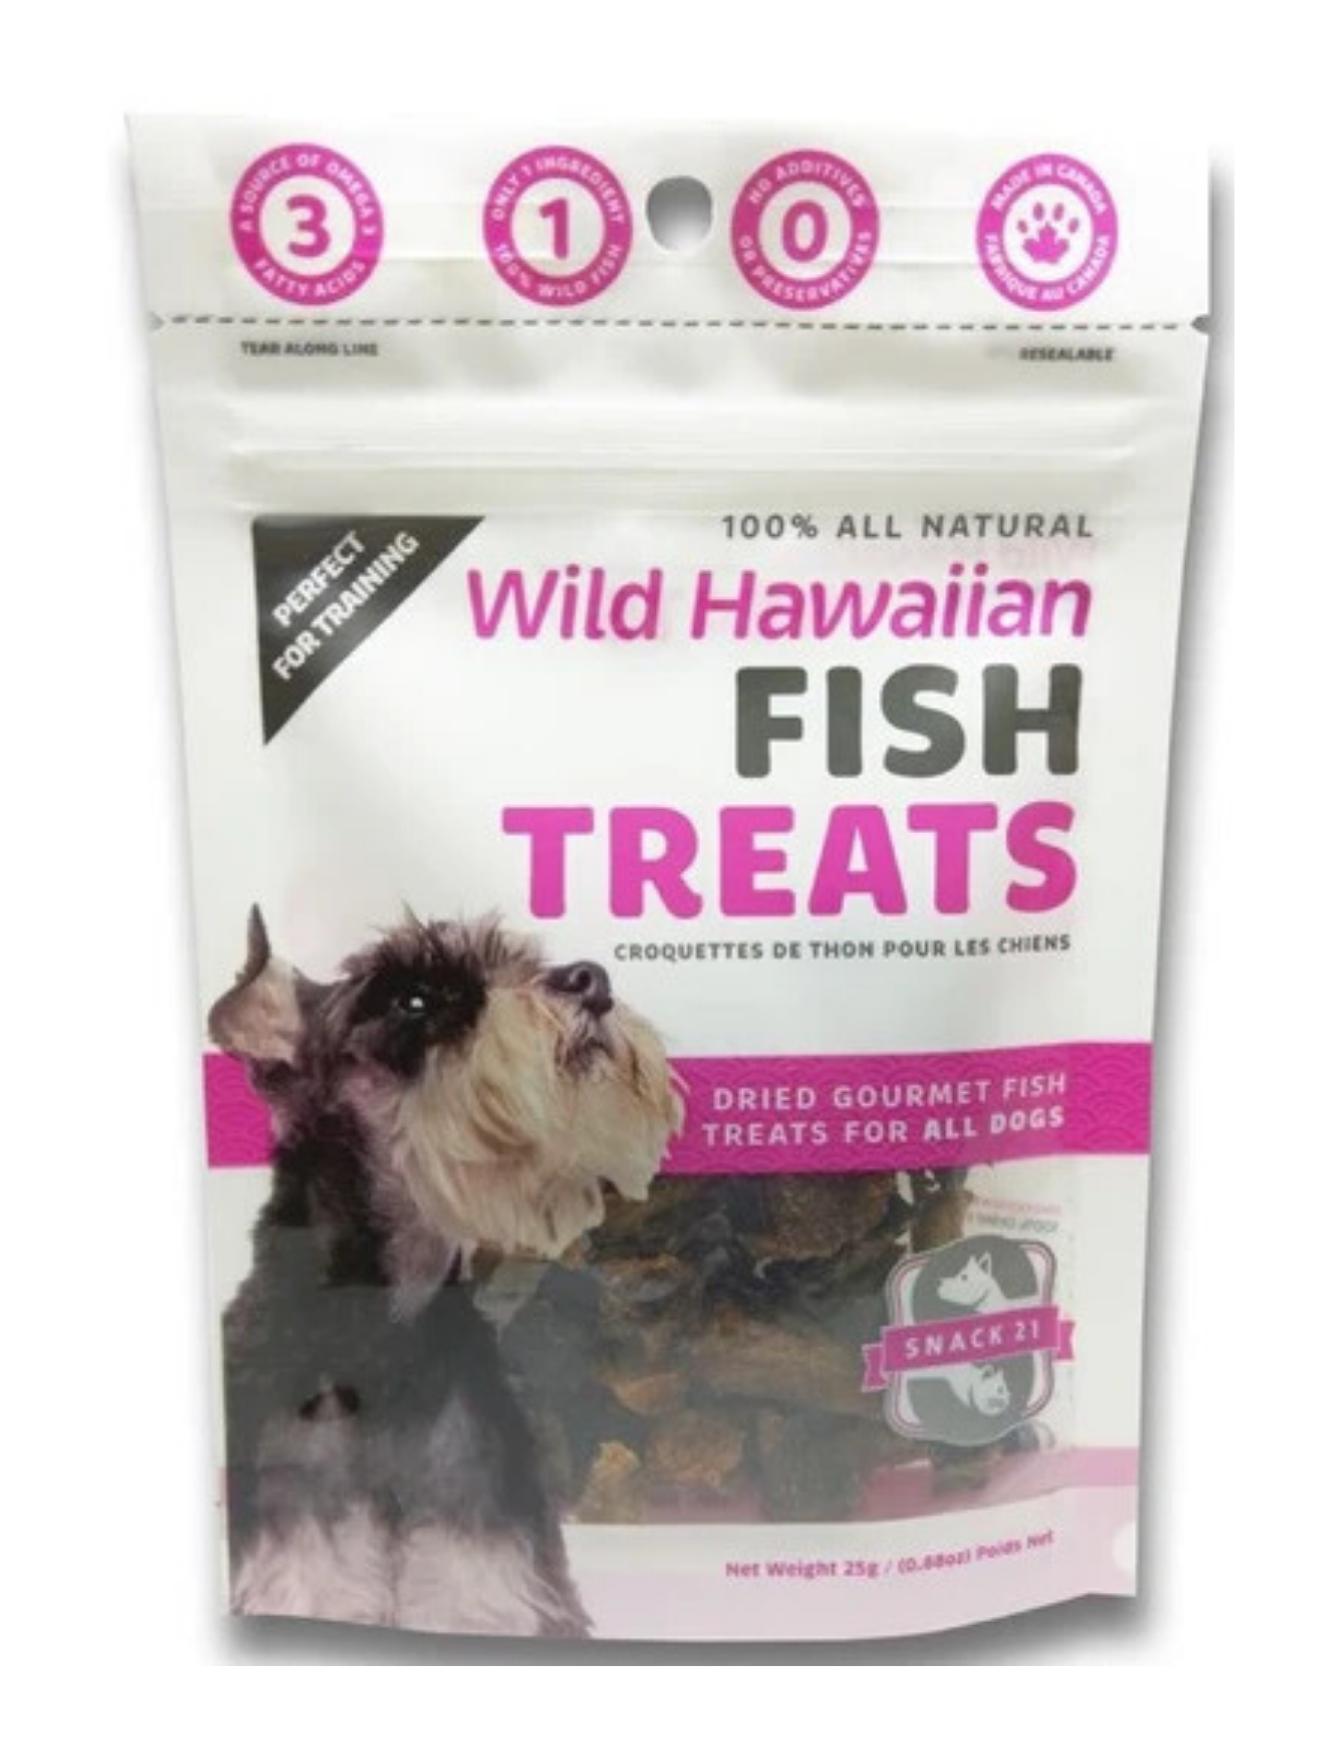 Wild Hawaiian Fish Treats (Tuna) for Dogs 25g